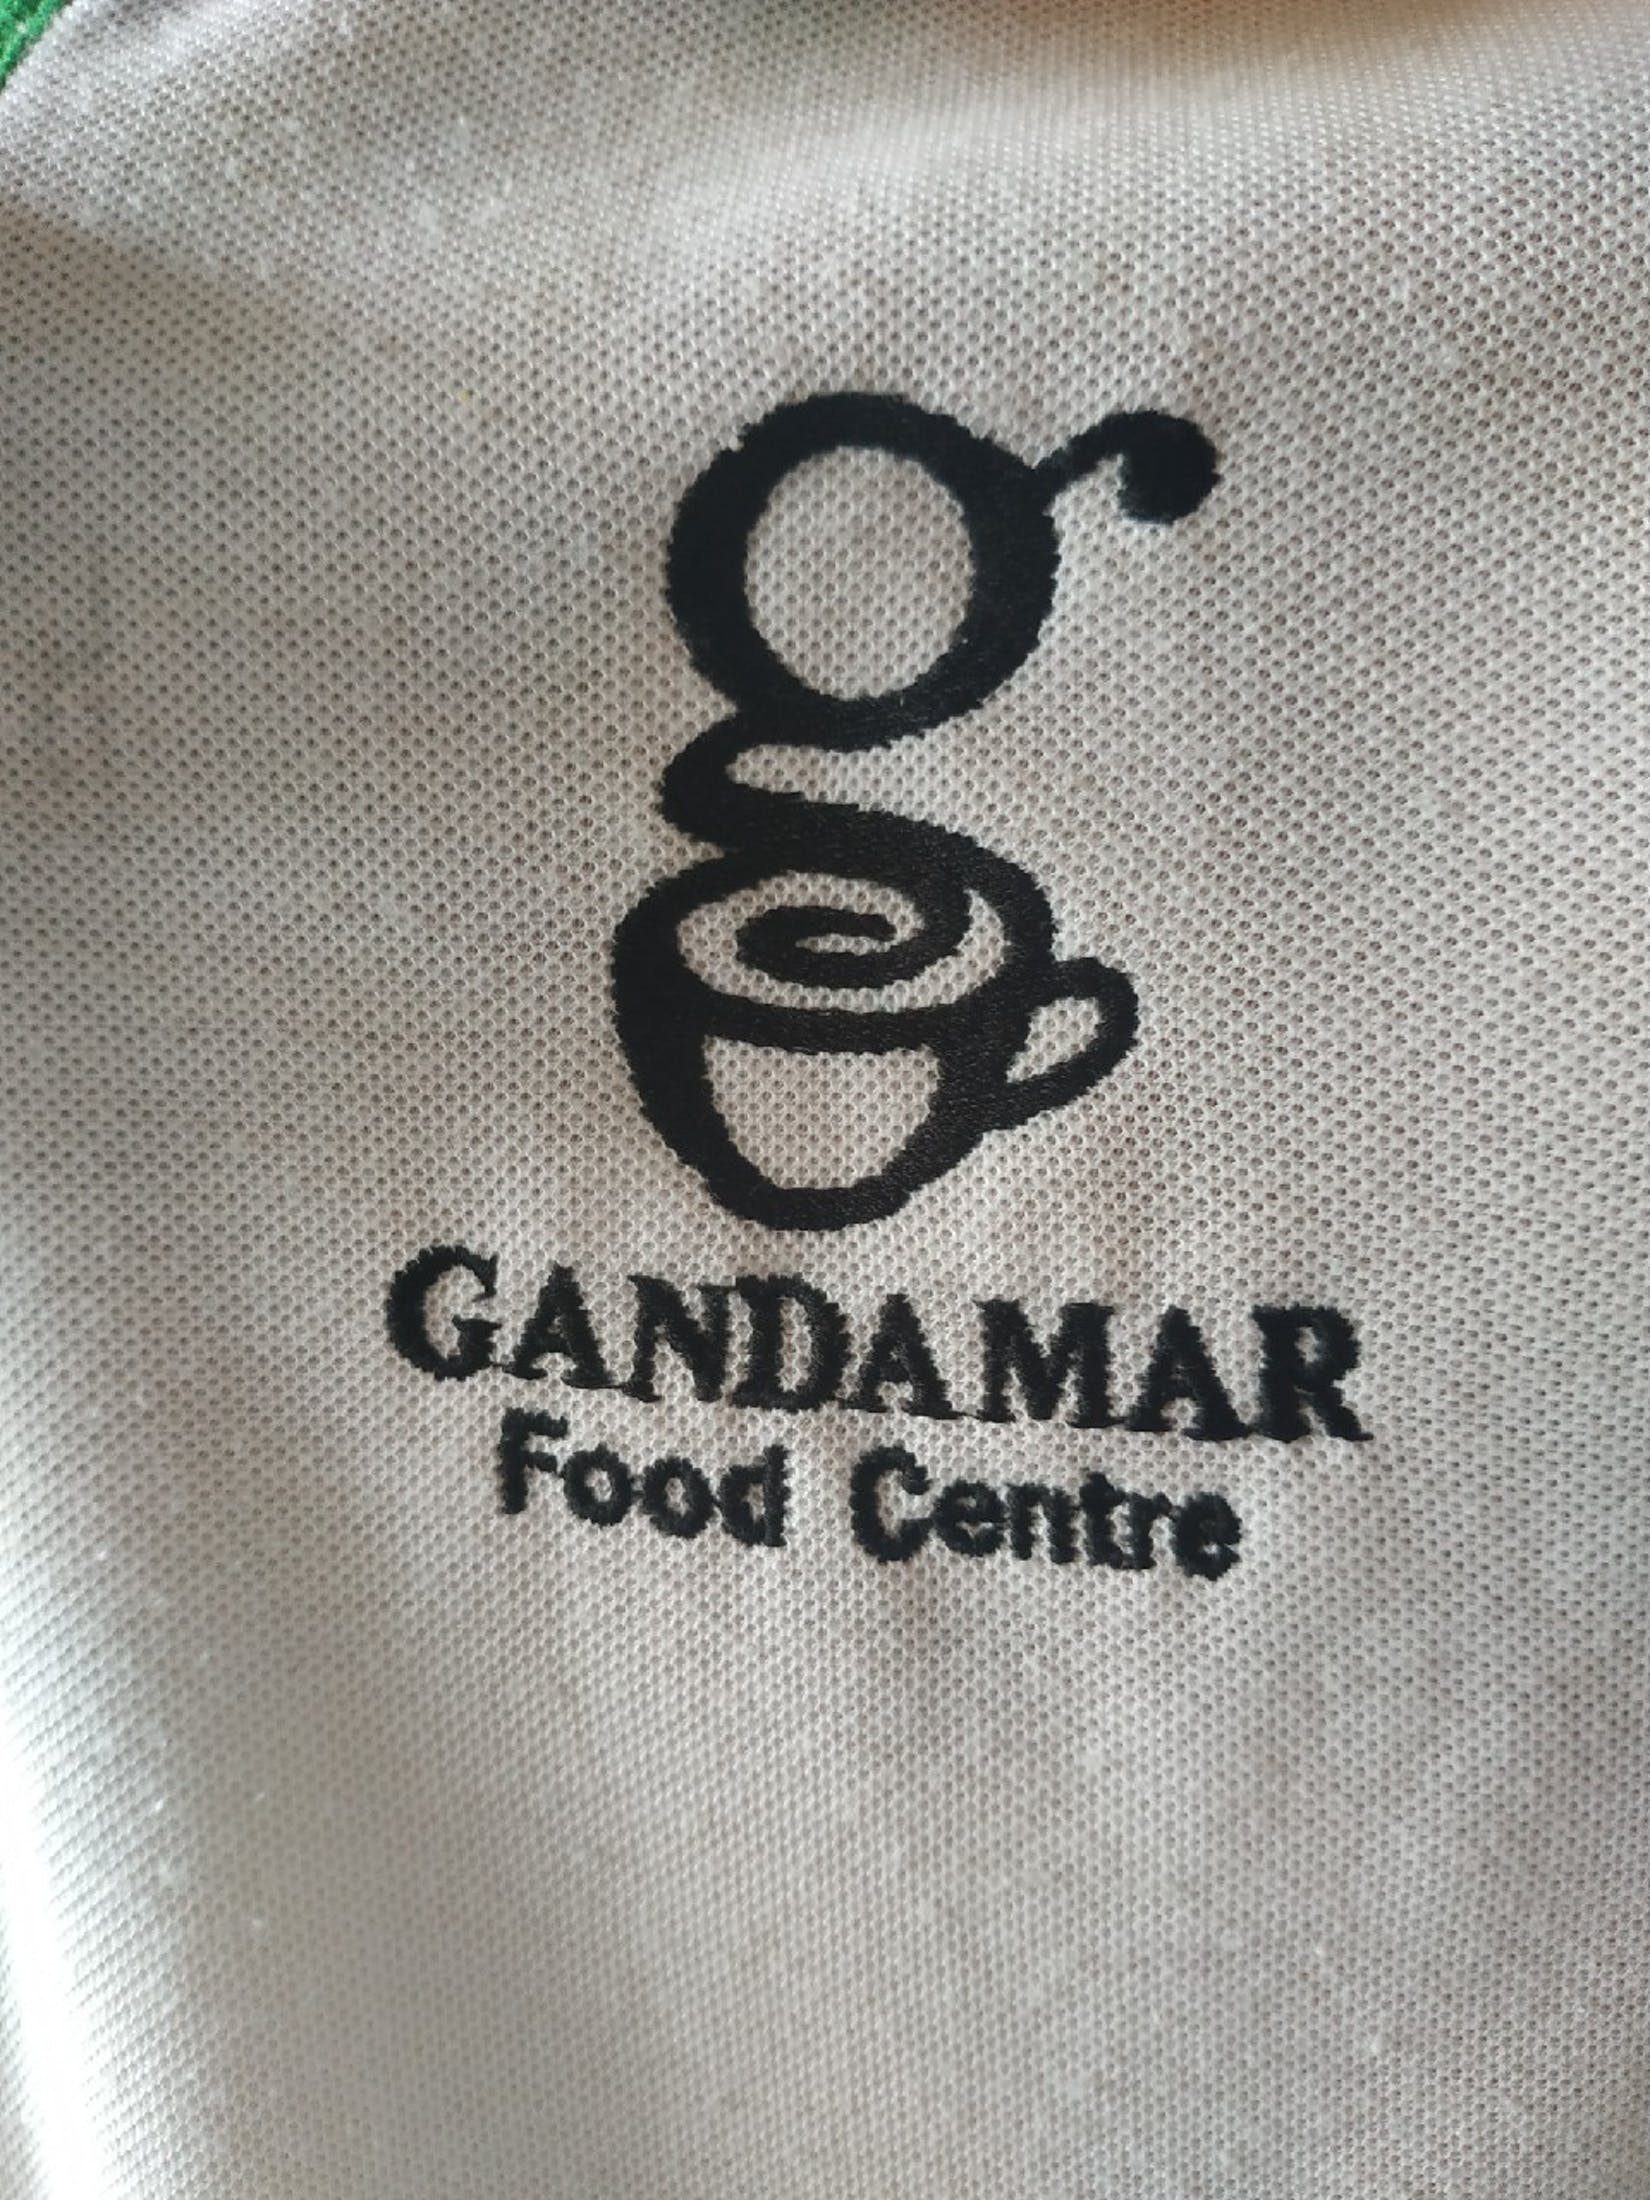 Gandamar Food Center (Mandalay) | yathar